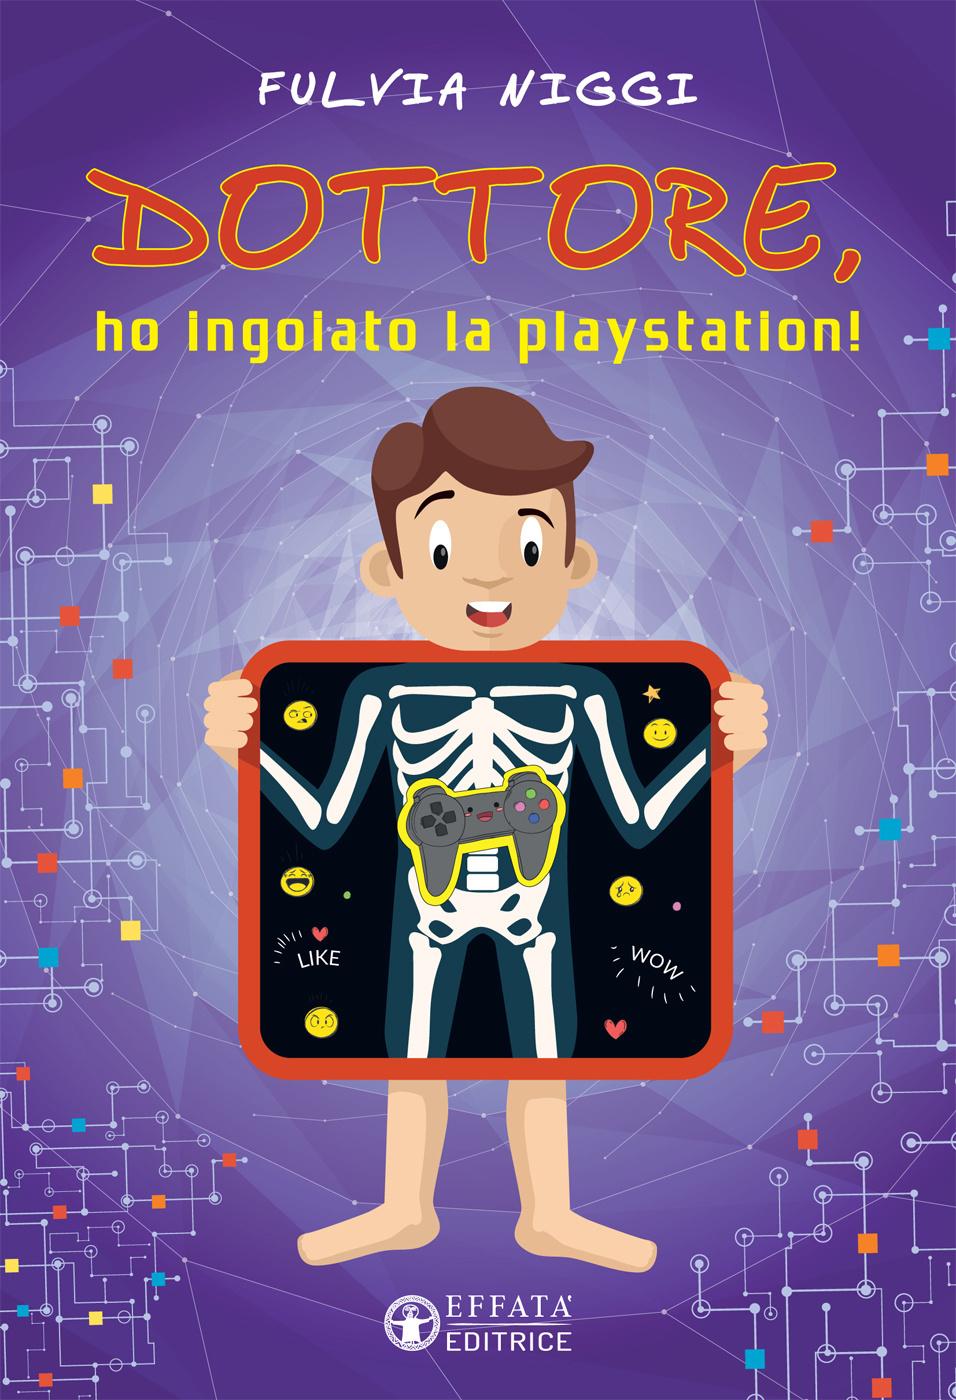 Dottore-ho-ingoiato-la-playstation